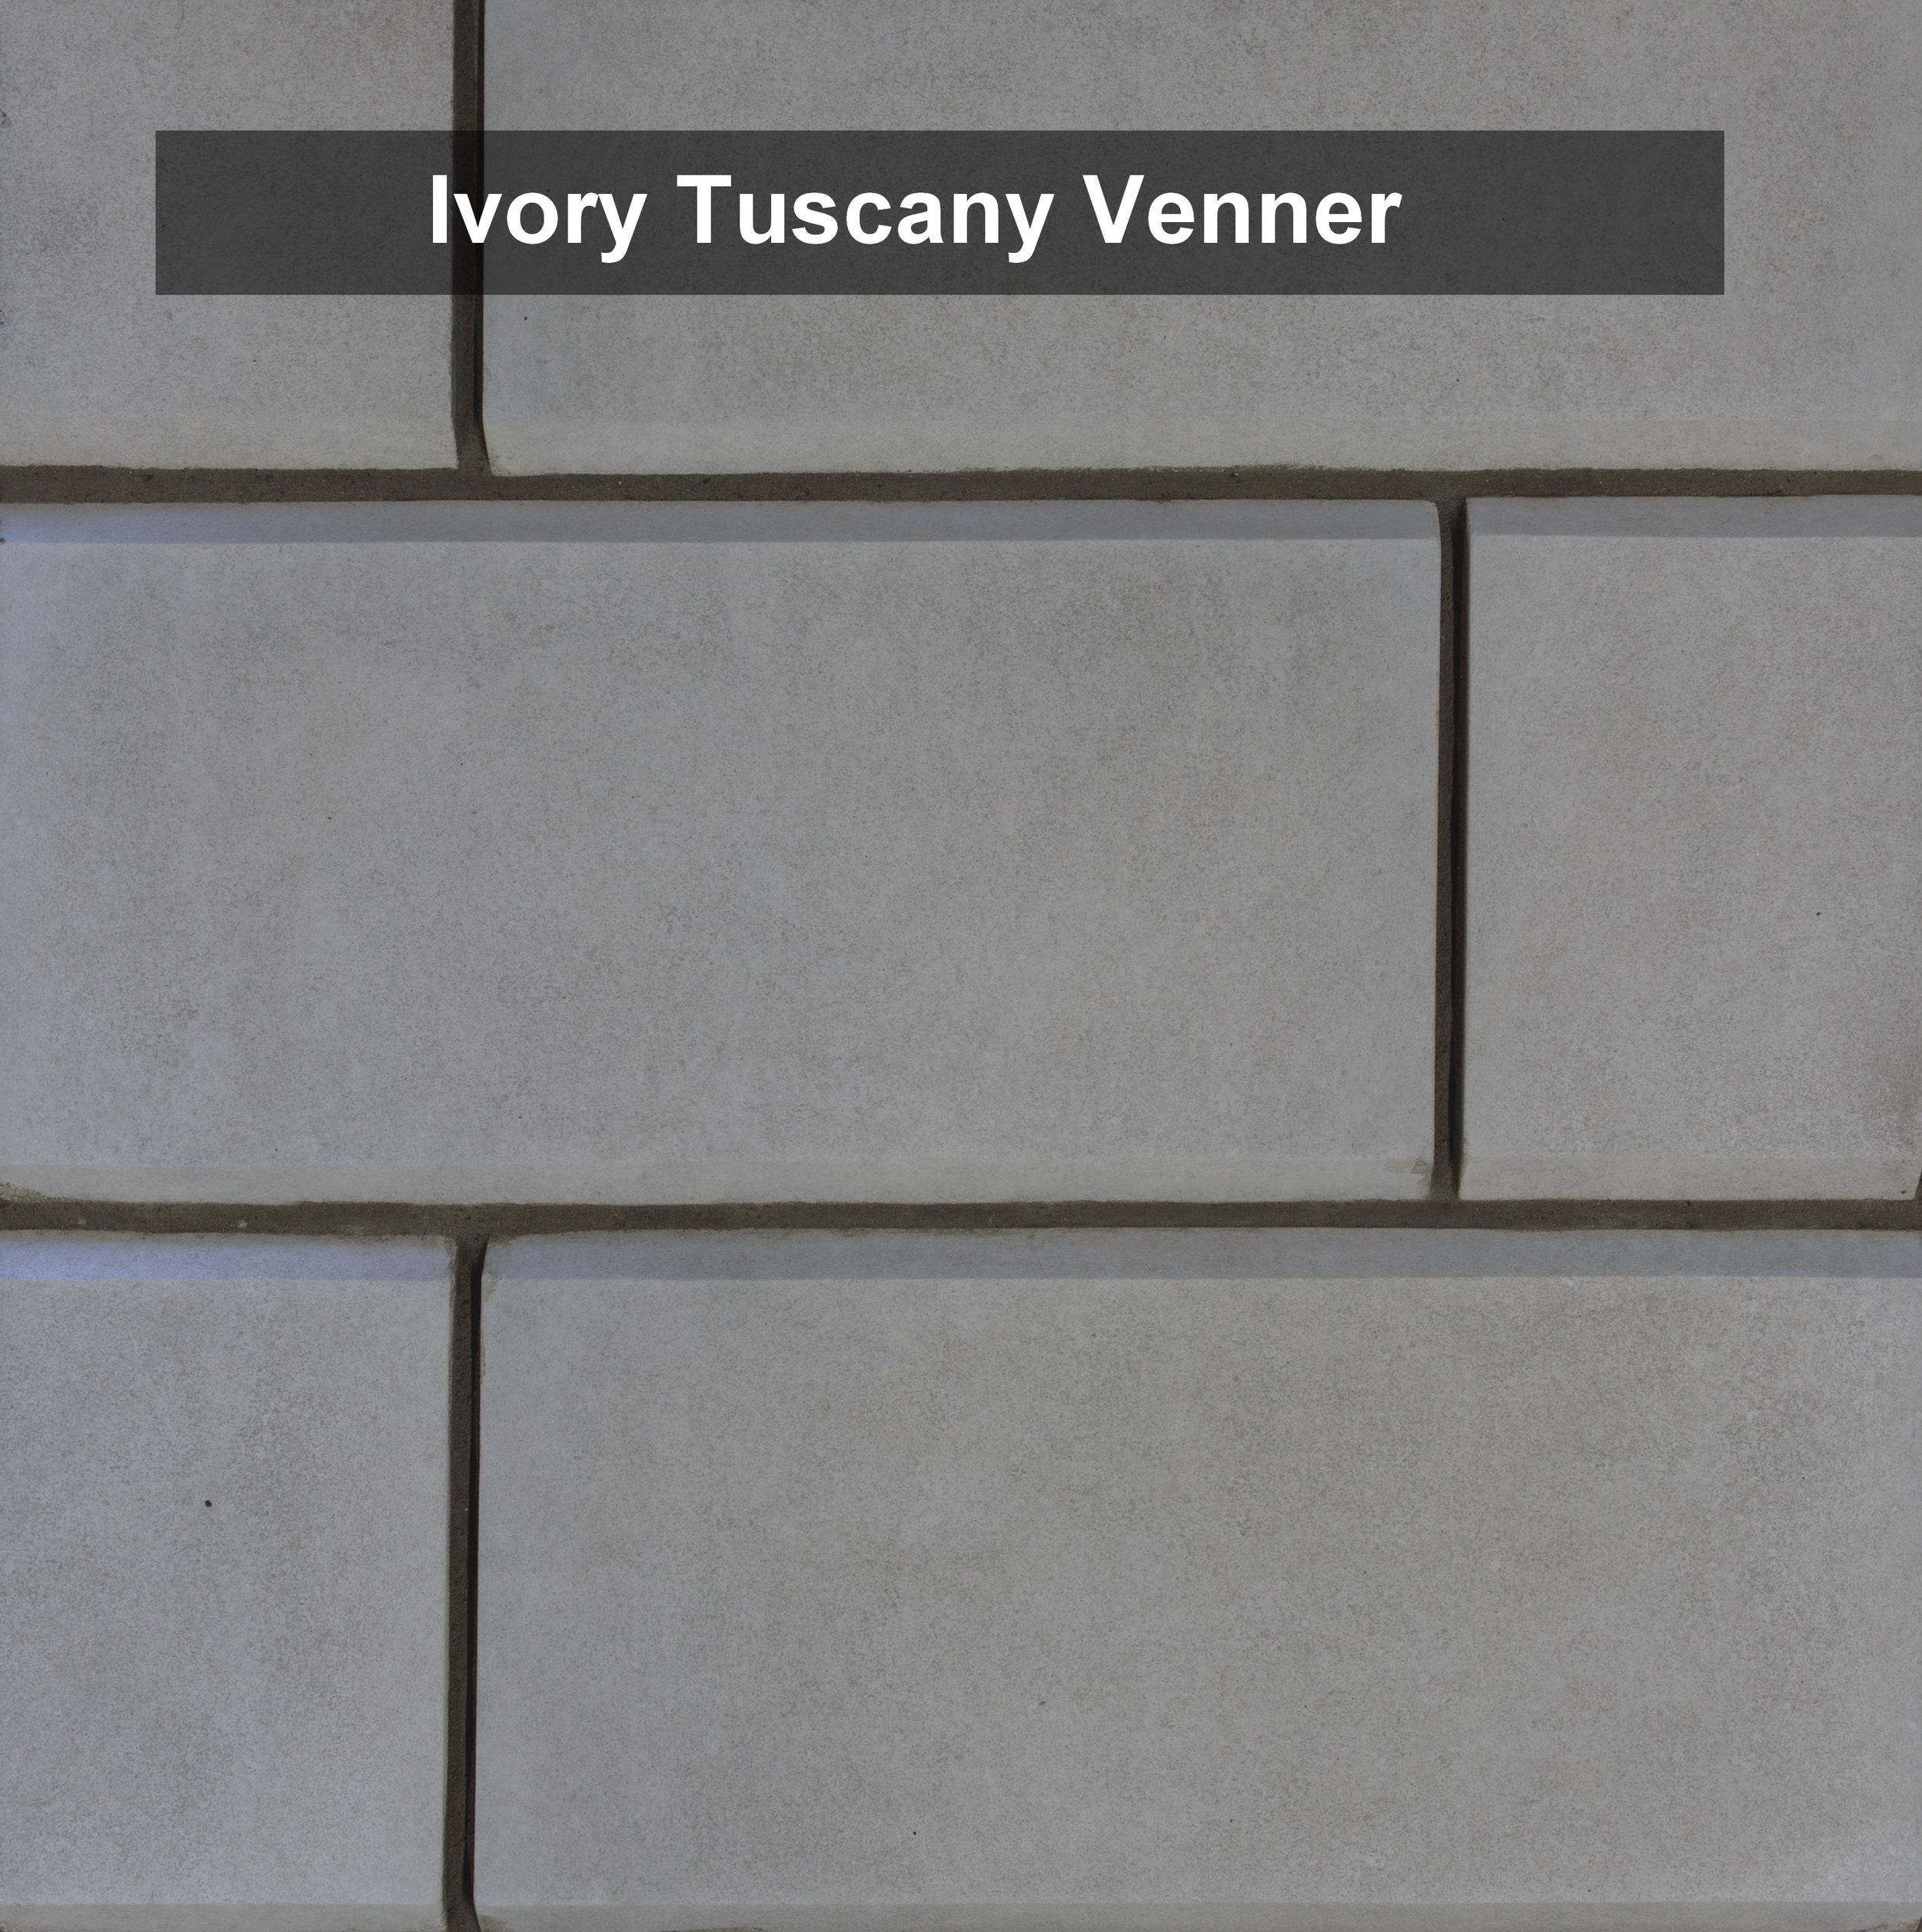 DQ_Tuscany Venner_Ivory_Profile.jpg